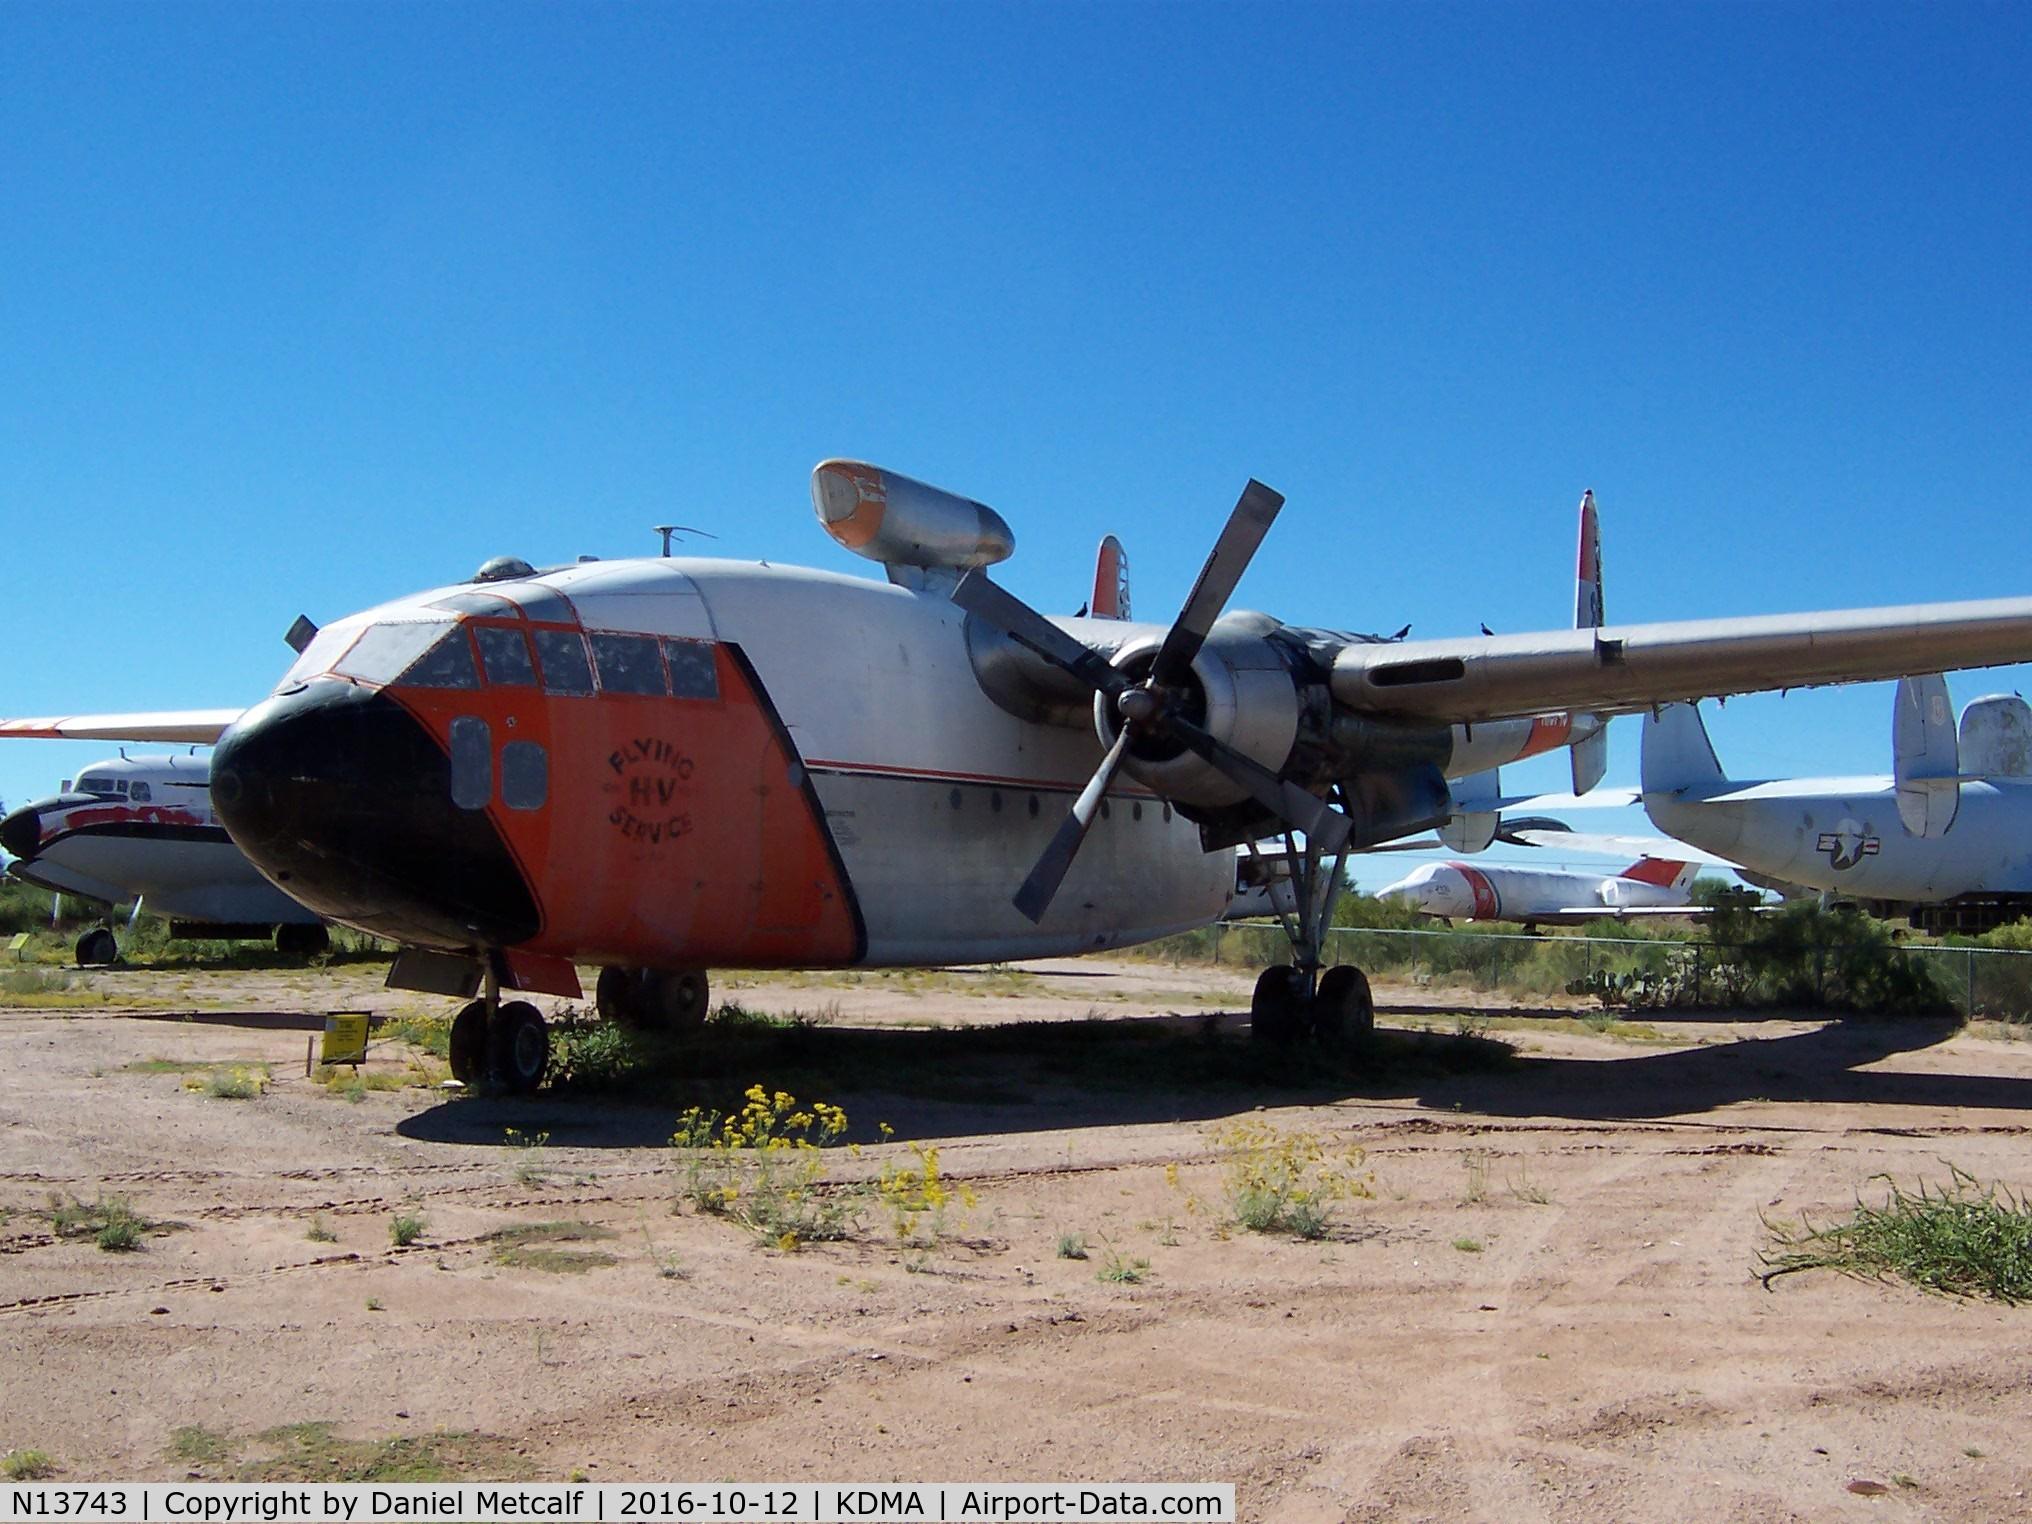 N13743, 1949 Fairchild C-119C Flying Boxcar C/N 10369 (49-132), Pima Air & Space Museum